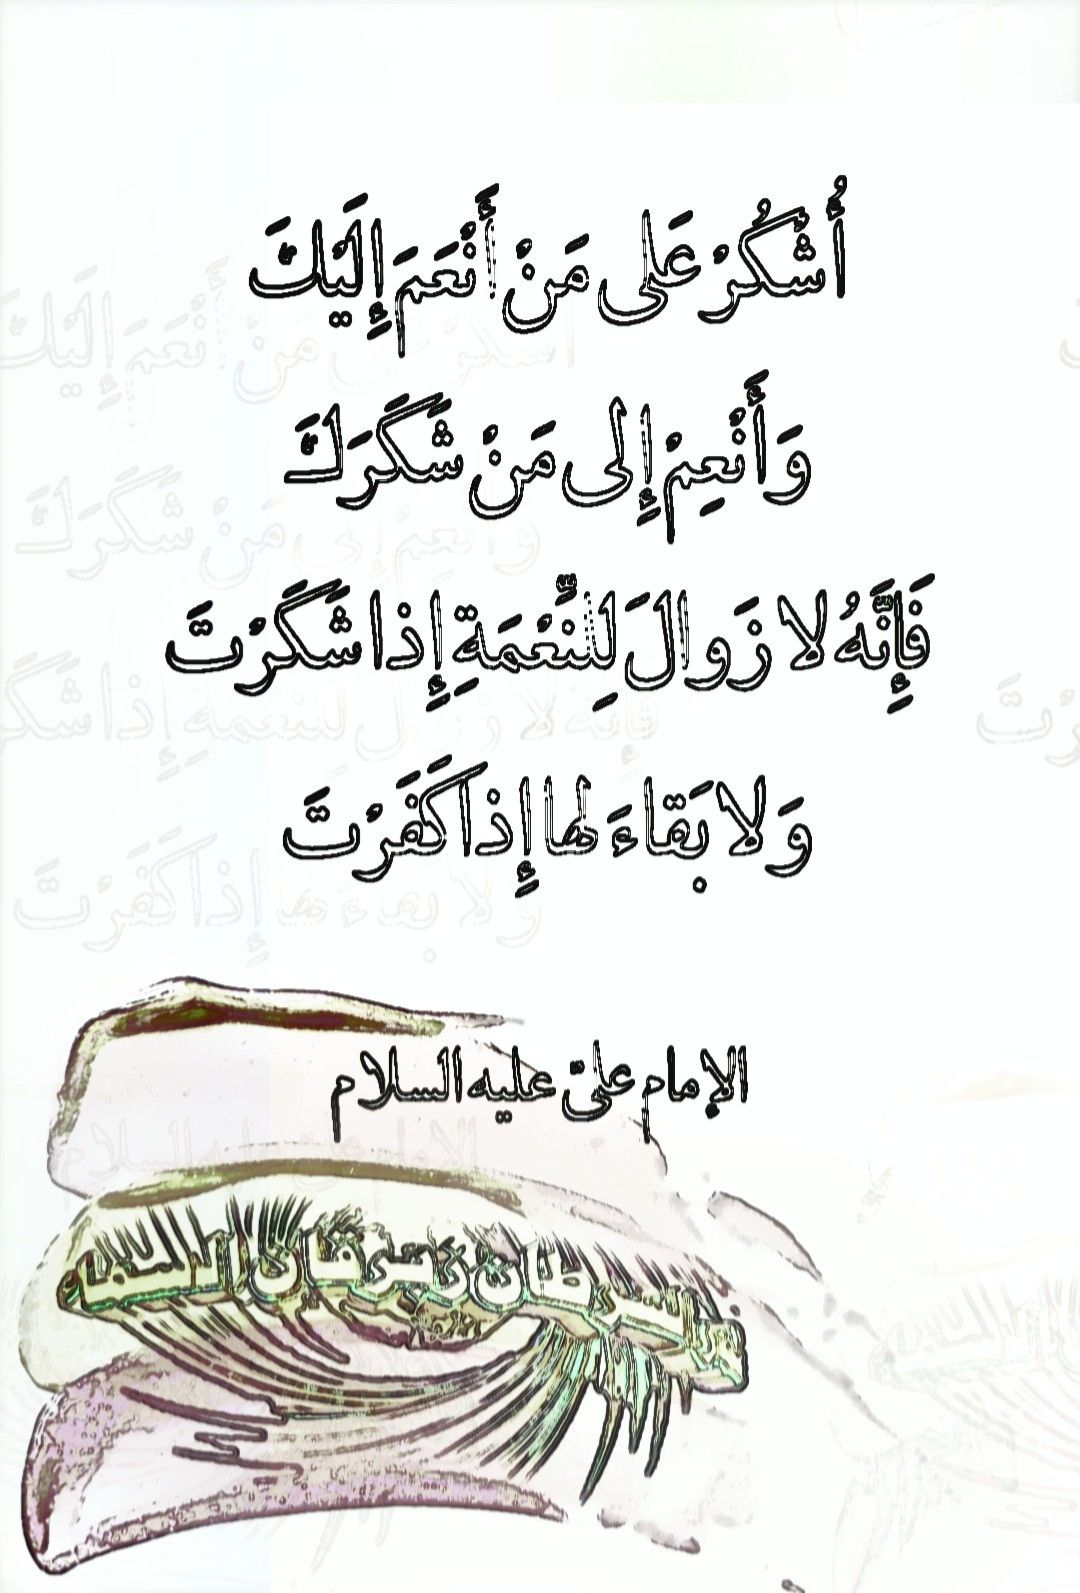 Pin By صياح الحمصي On الإمام علي عليه السلام Islam Hadith Hadith Islam